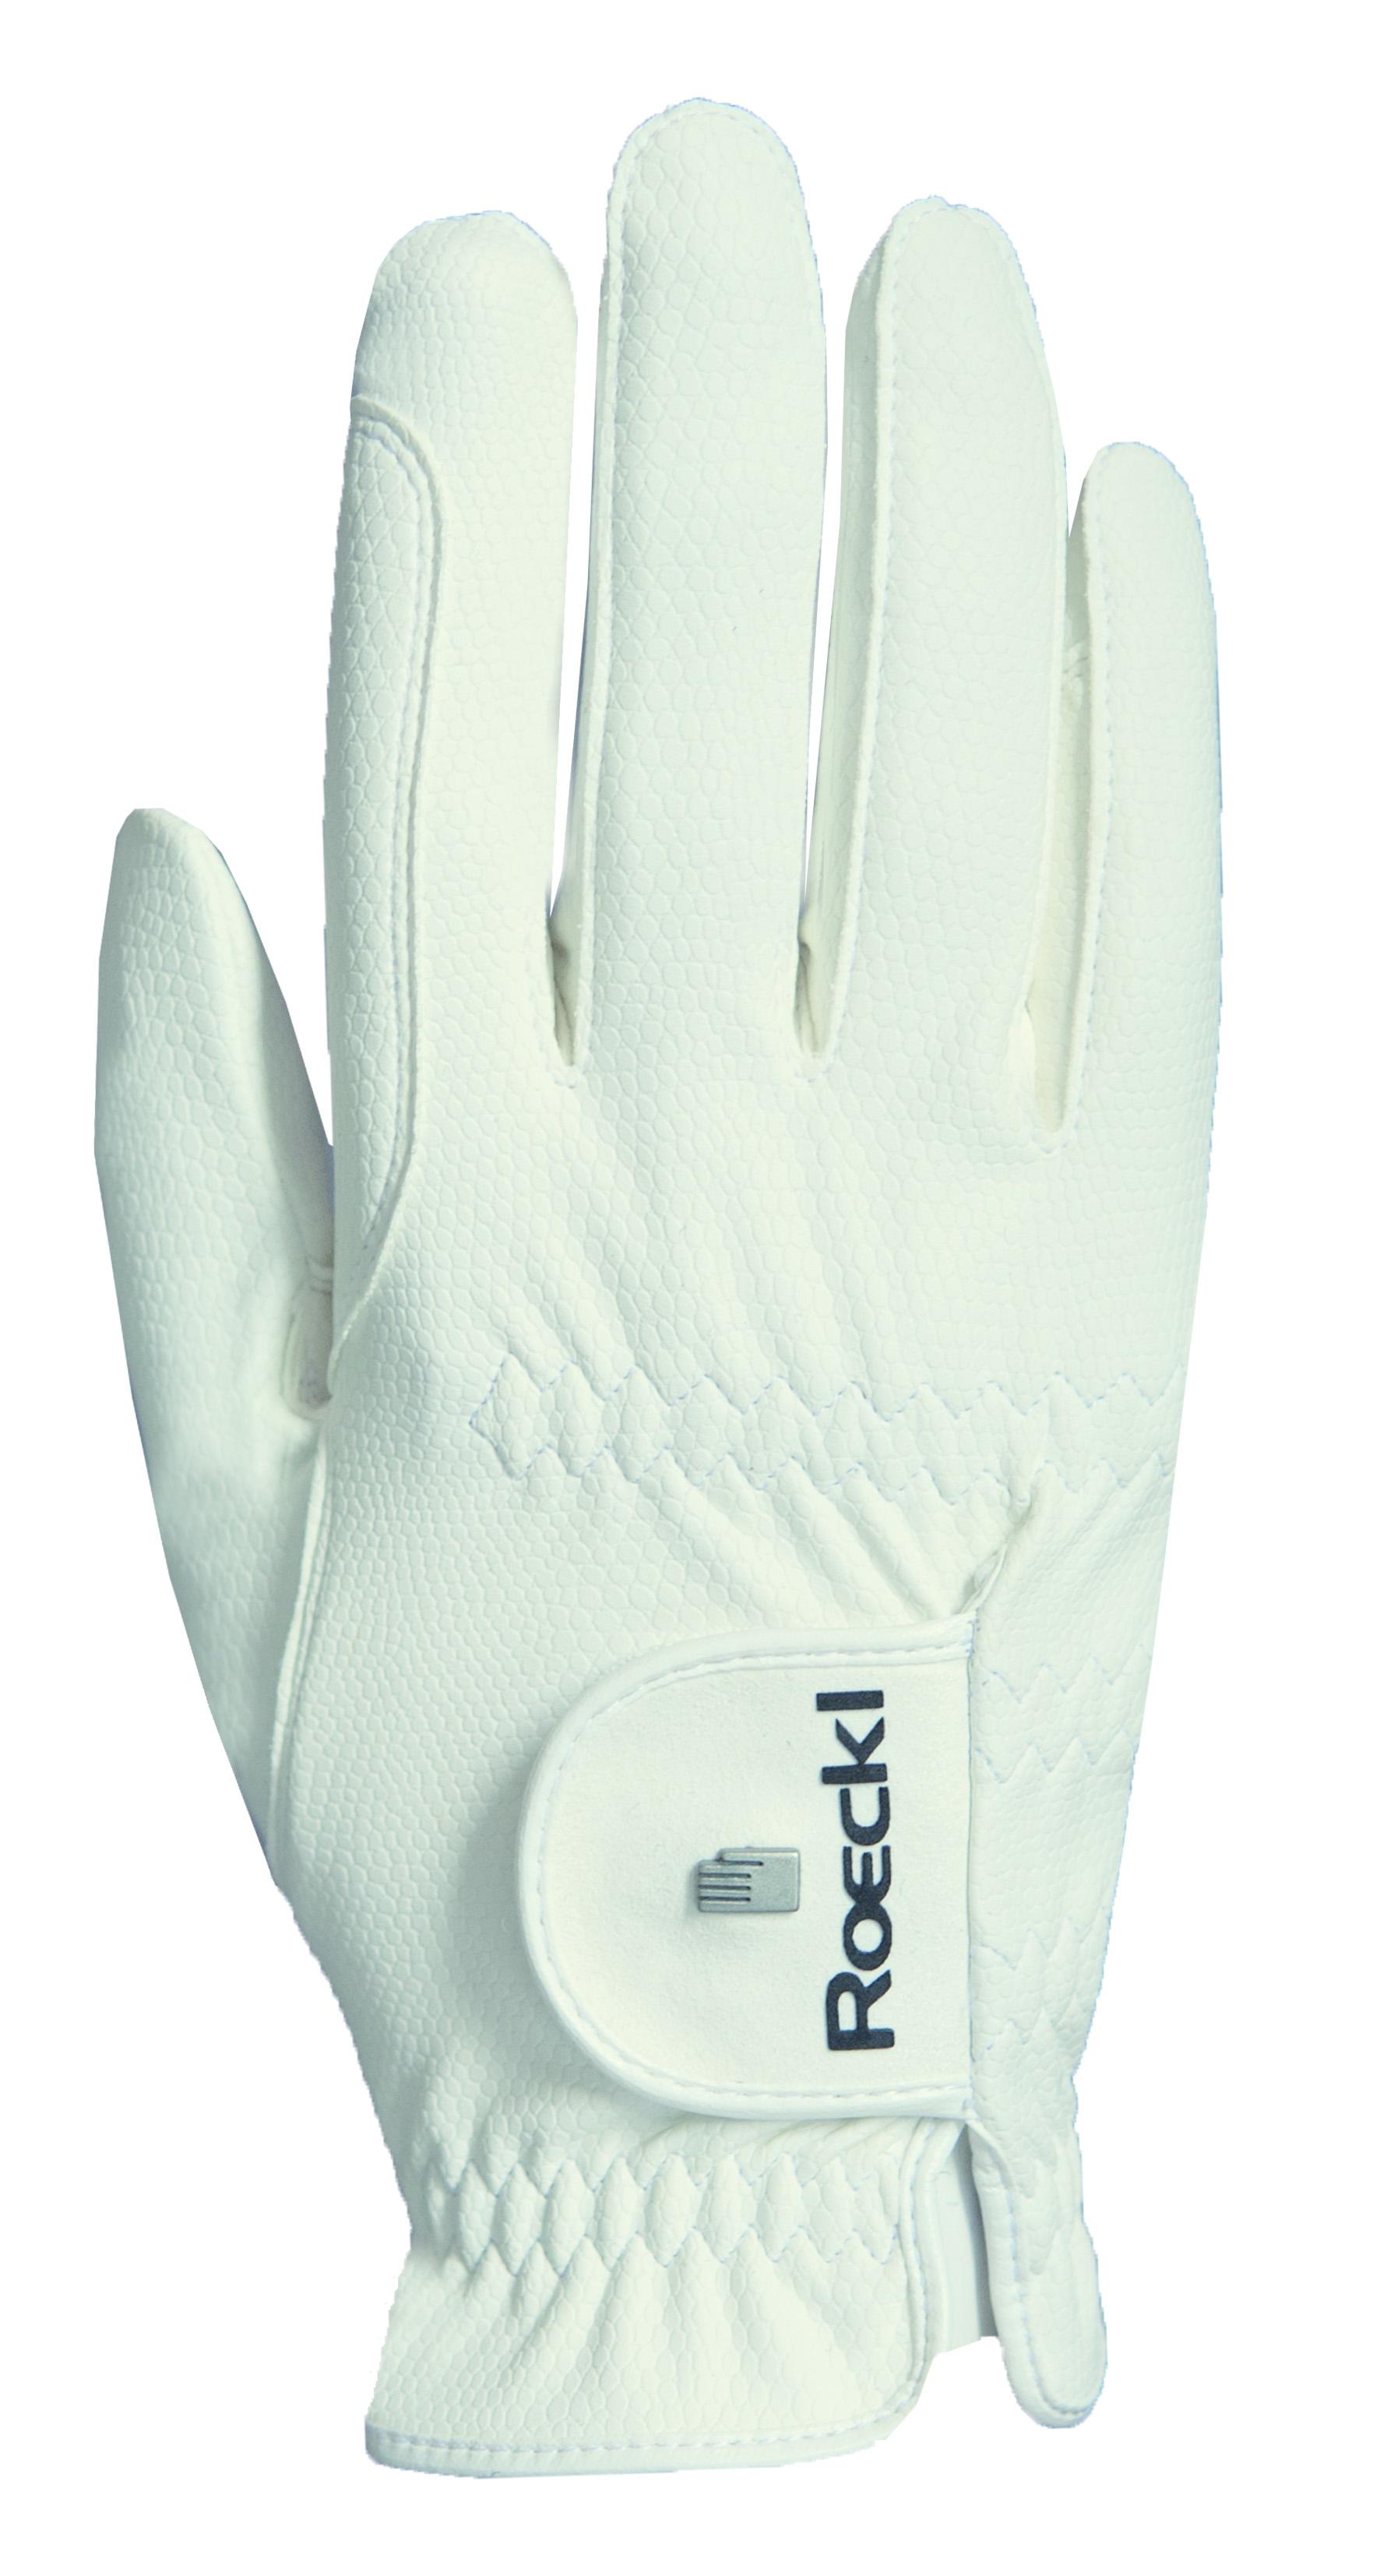 3301-108-100 Roeck-Grip Pro